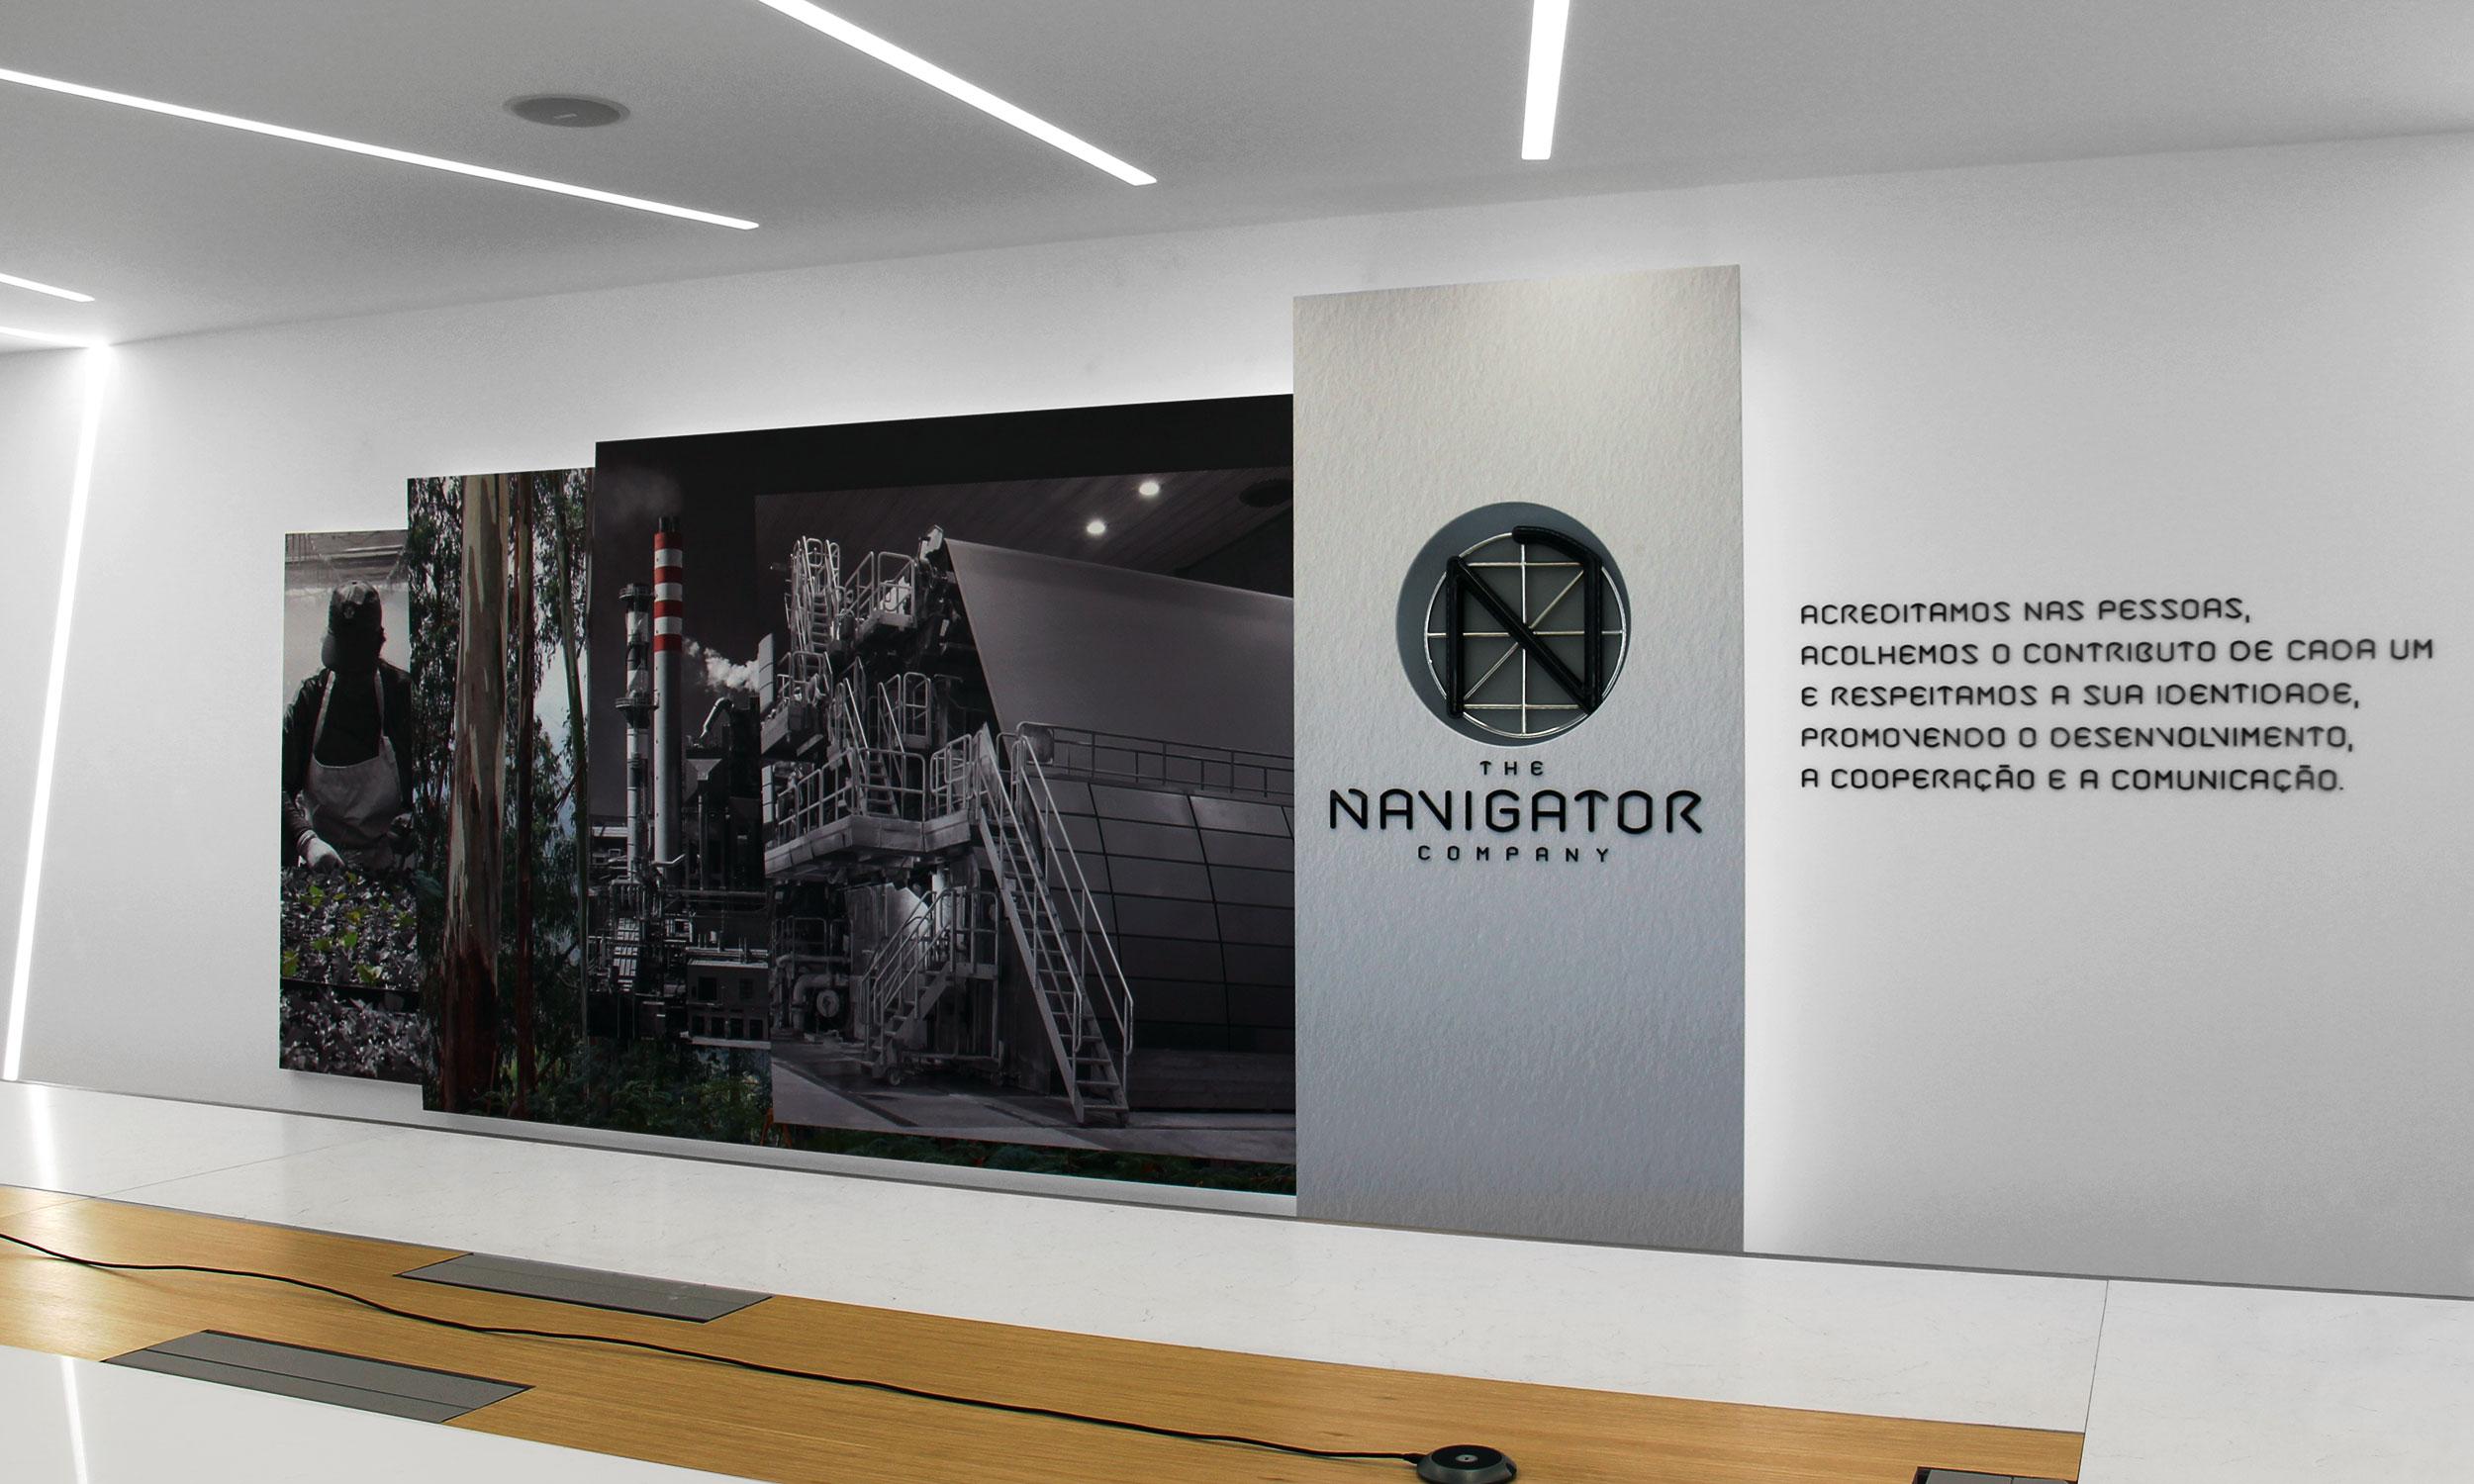 Project_Navigator_001